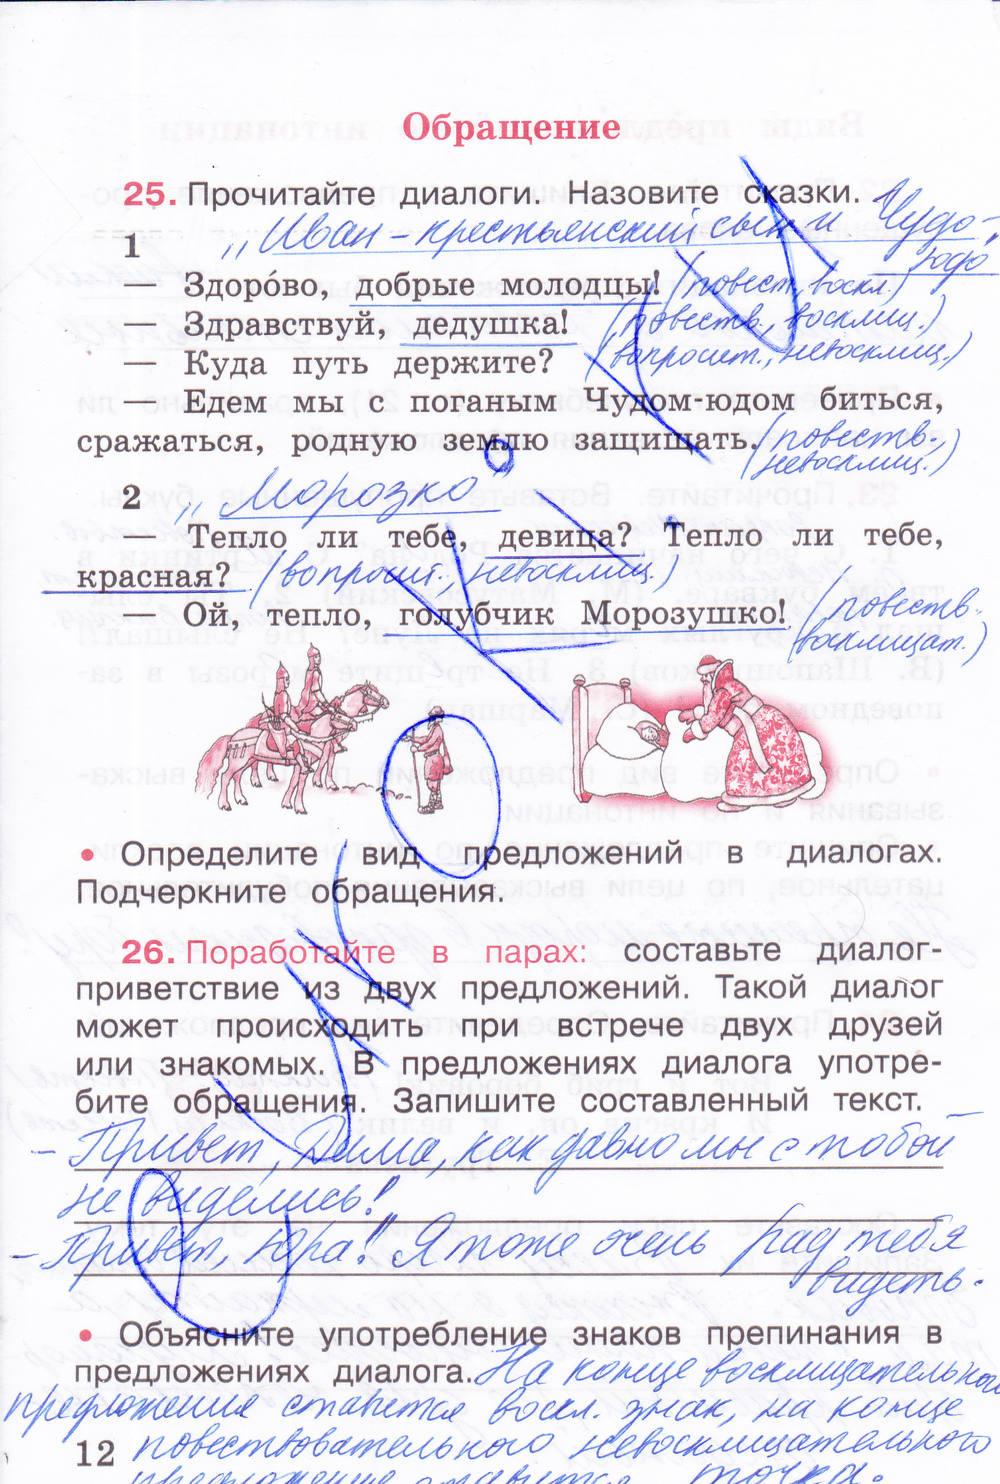 гдз по русскому языку 3 класс канакина 1 часть рабочая тетрадь 2018г